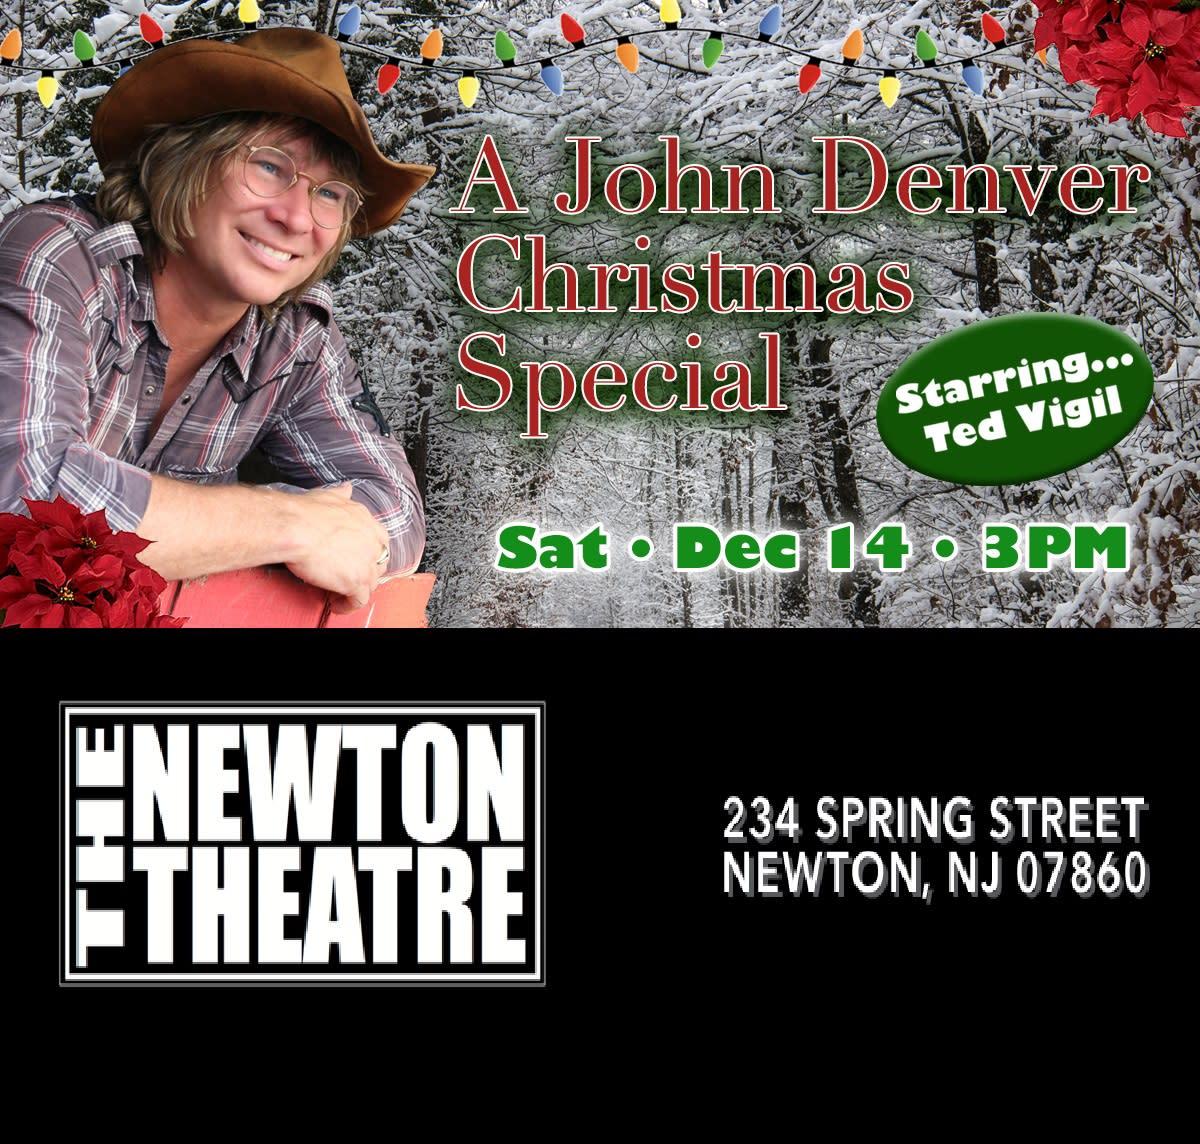 John Denver Christmas.A John Denver Christmas